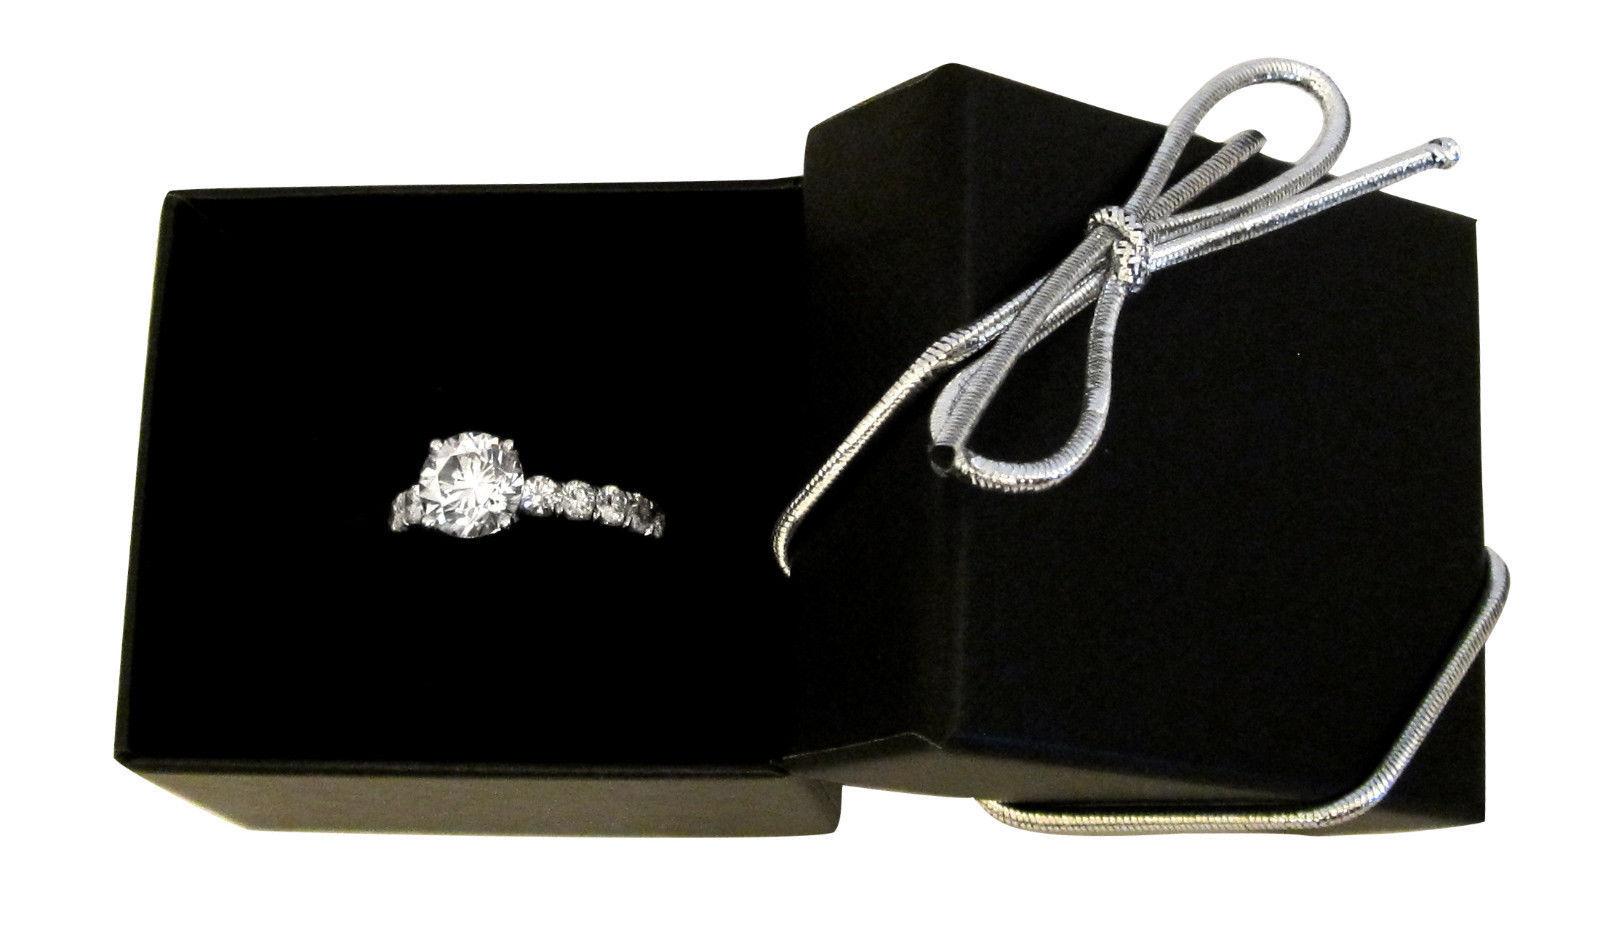 10K GOLD WEDDING BAND TRI COLOR MULTI TONED BRAIDED WEDDING RING MENS WOMENS